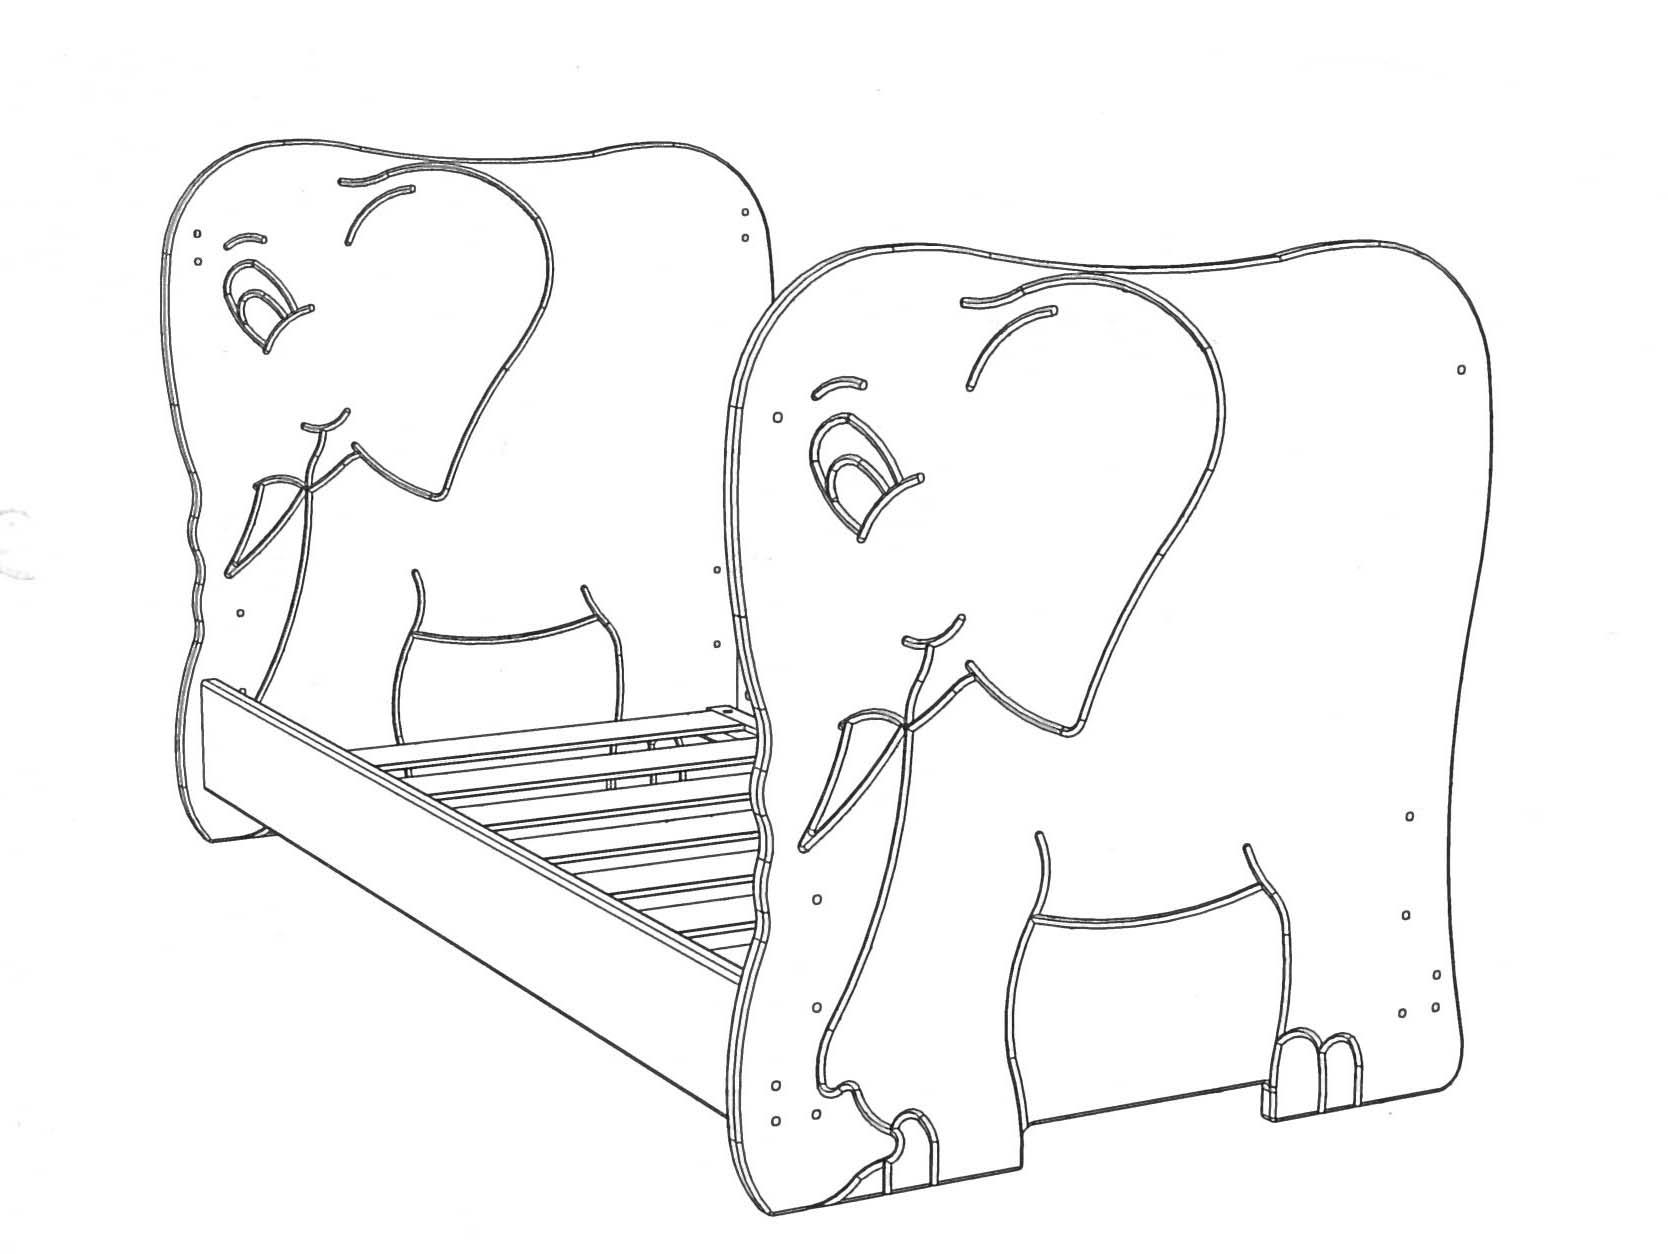 babybett elefant kinderbett holz massiv 70x140 cm ohne schadstoffe online vom hersteller. Black Bedroom Furniture Sets. Home Design Ideas